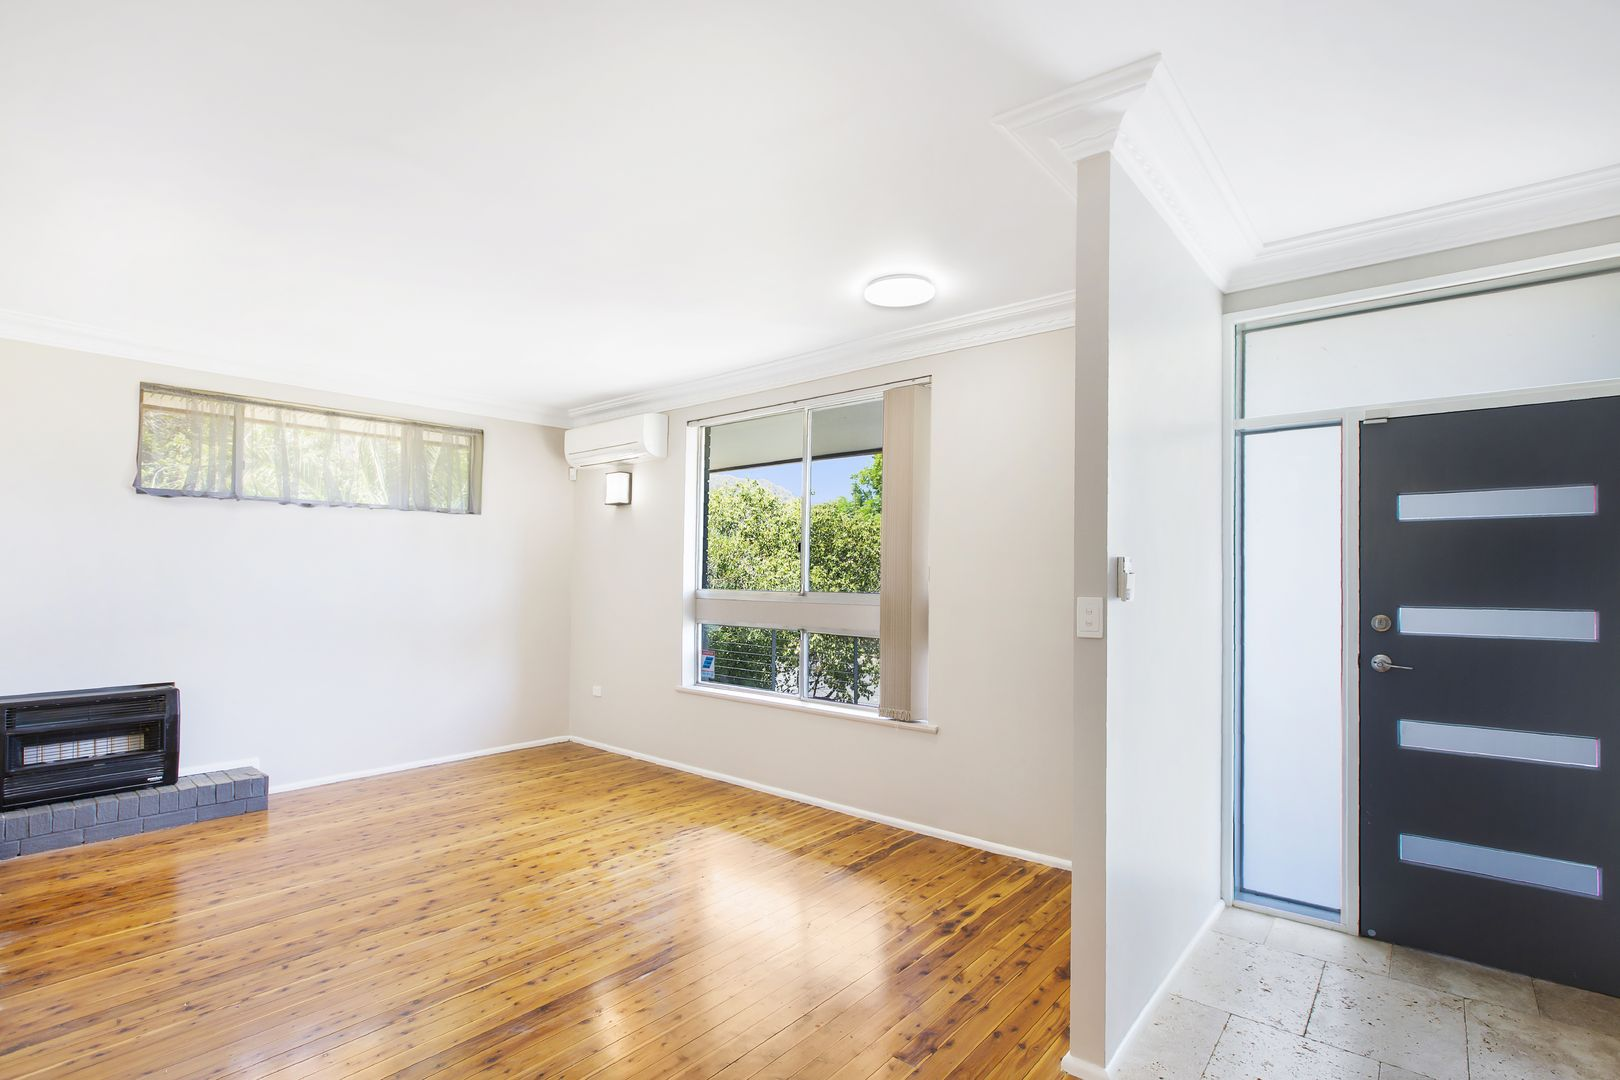 10 Dekalb Street, Tamworth NSW 2340, Image 1